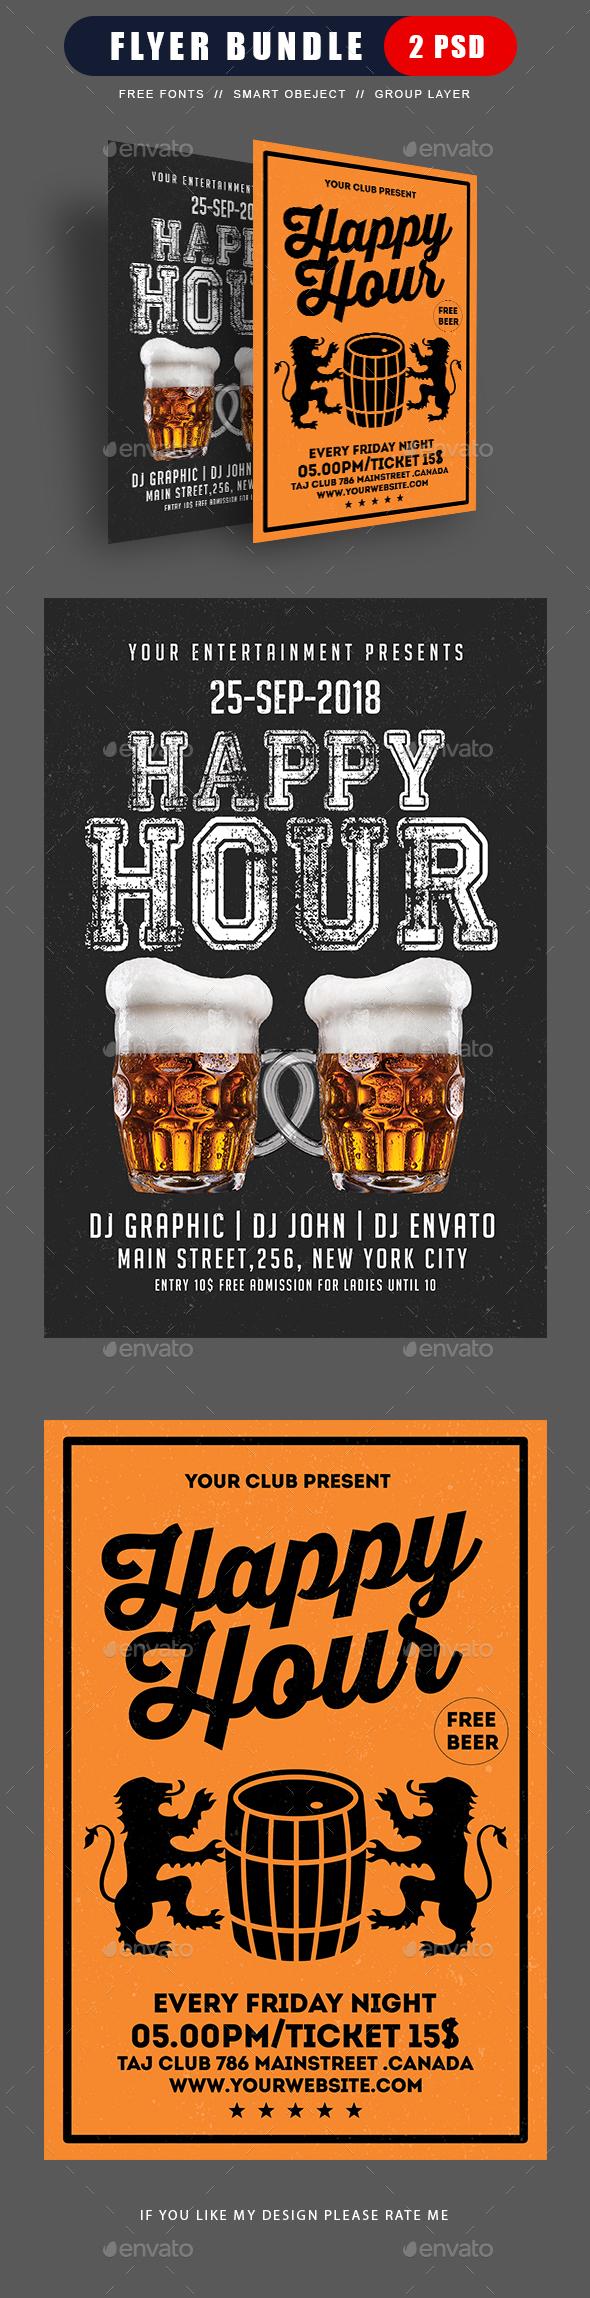 Happy Hour Beer Promotion Bundle - Events Flyers